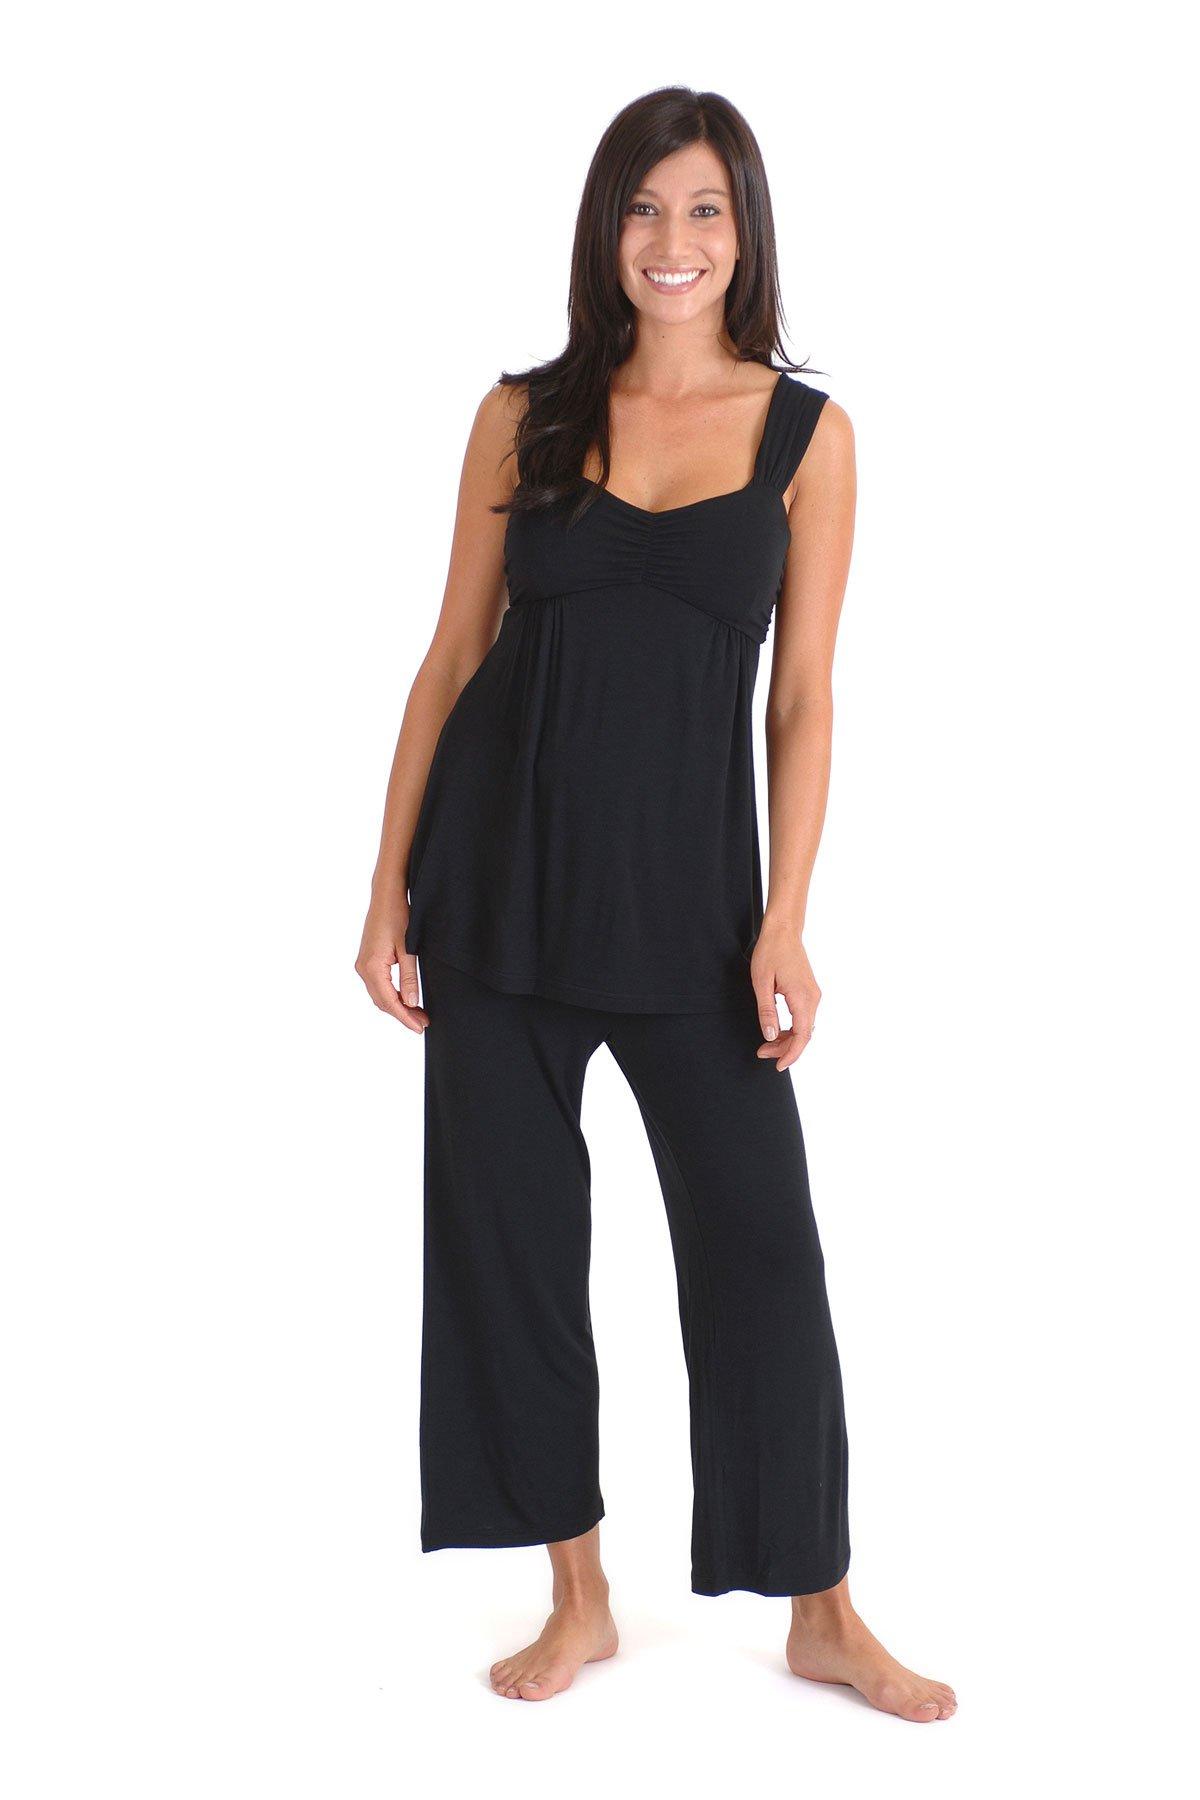 Large Black Bamboo Dreams Cleo Pajama Set